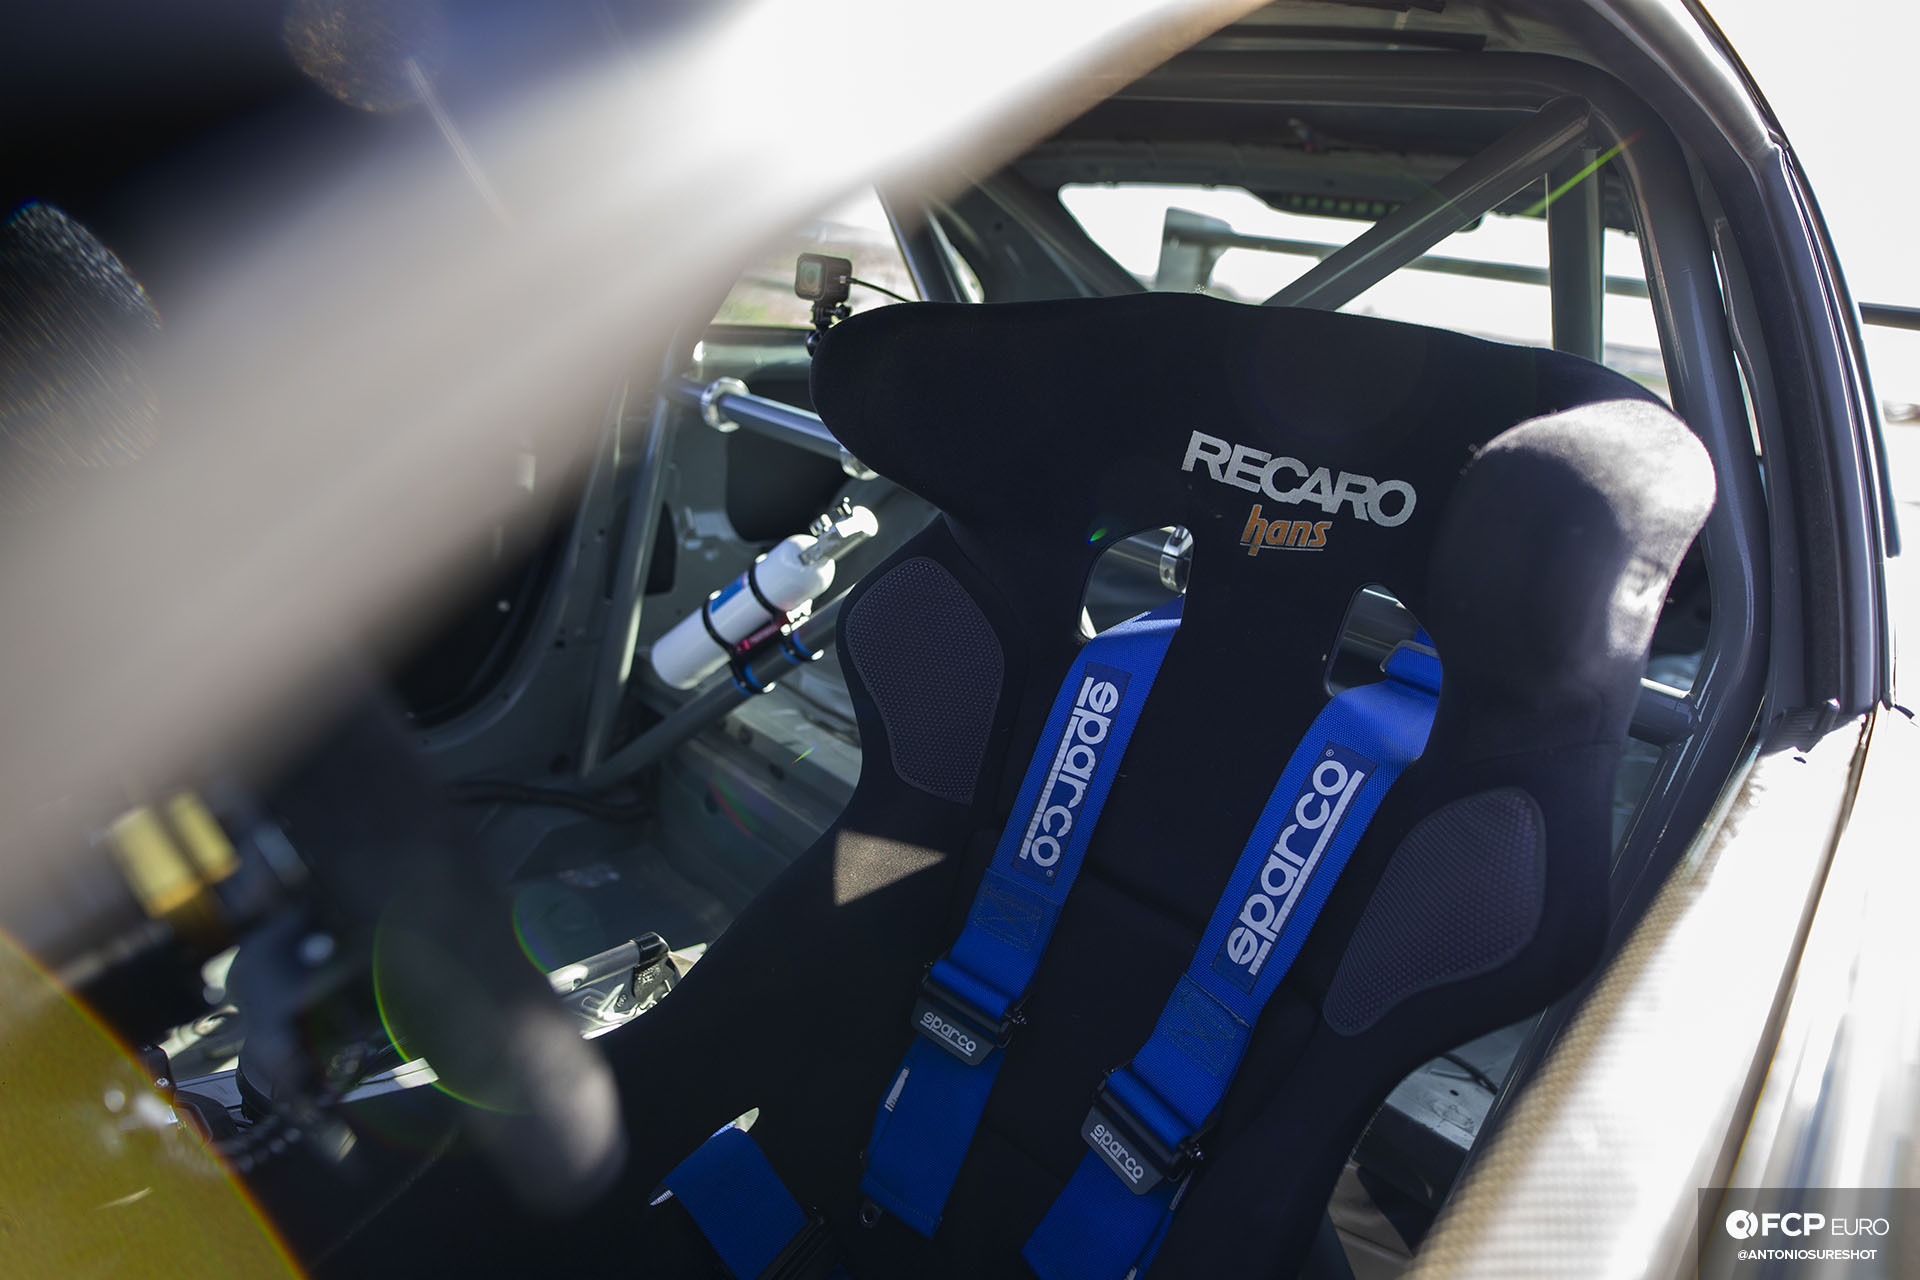 Bimmer Challenge BMW E92 M3 Recaro Hans XL Seat FCP Euro